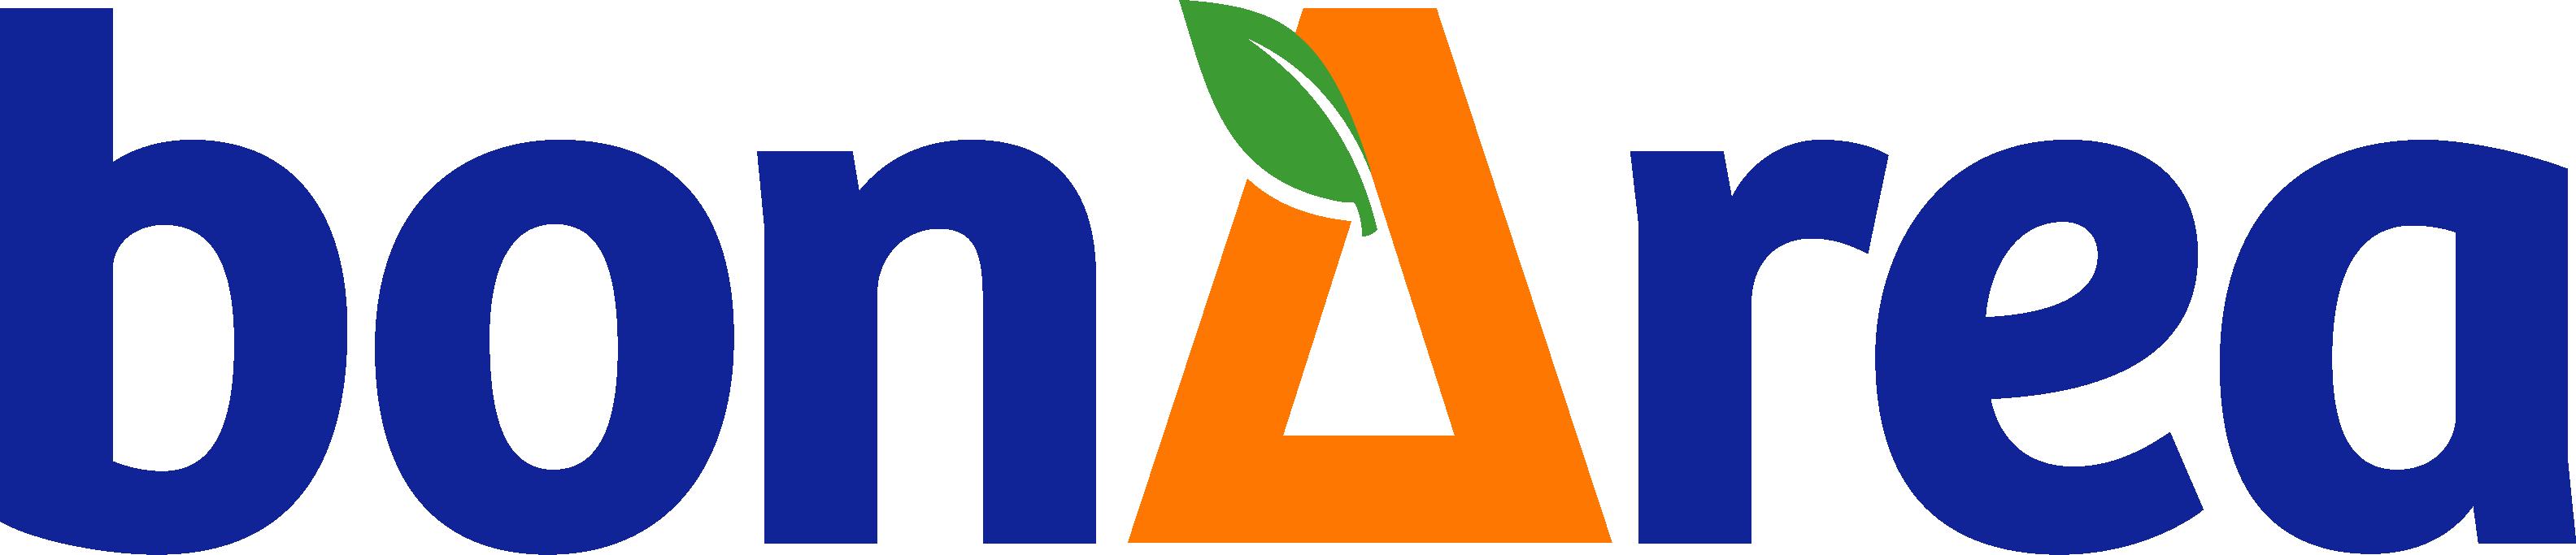 BONAREA (FRAGA)